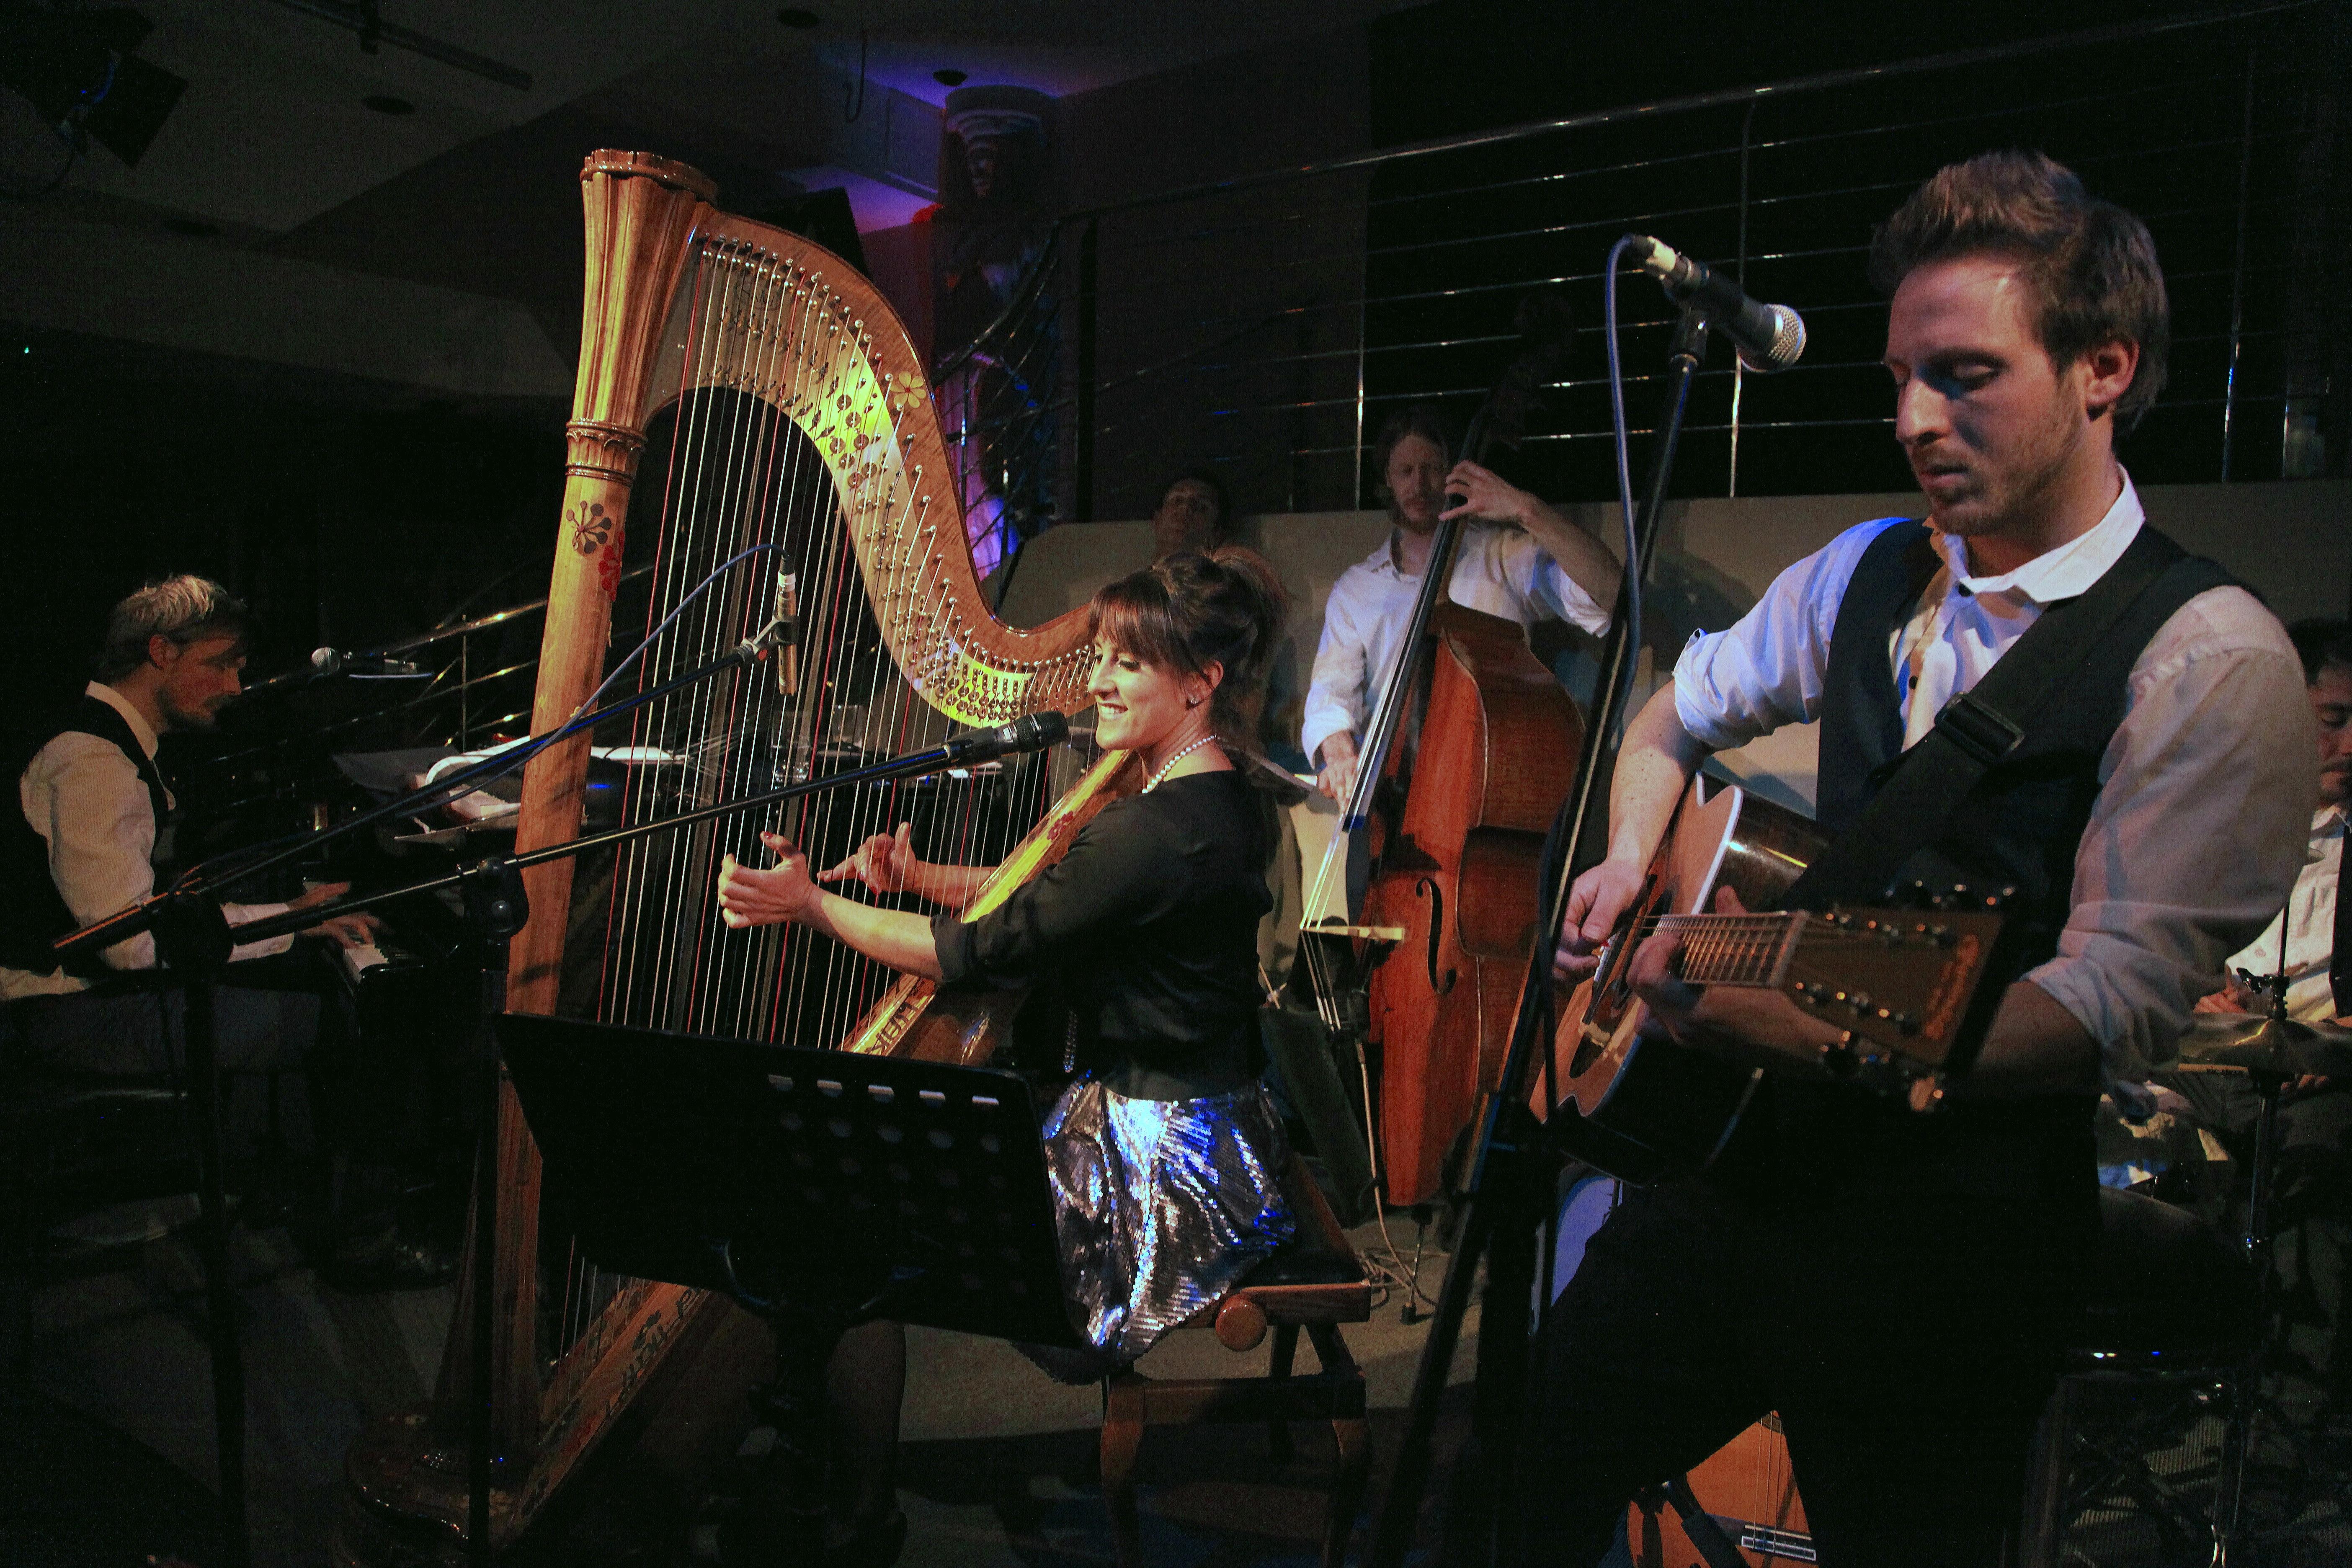 Lucinda Belle Orchestra